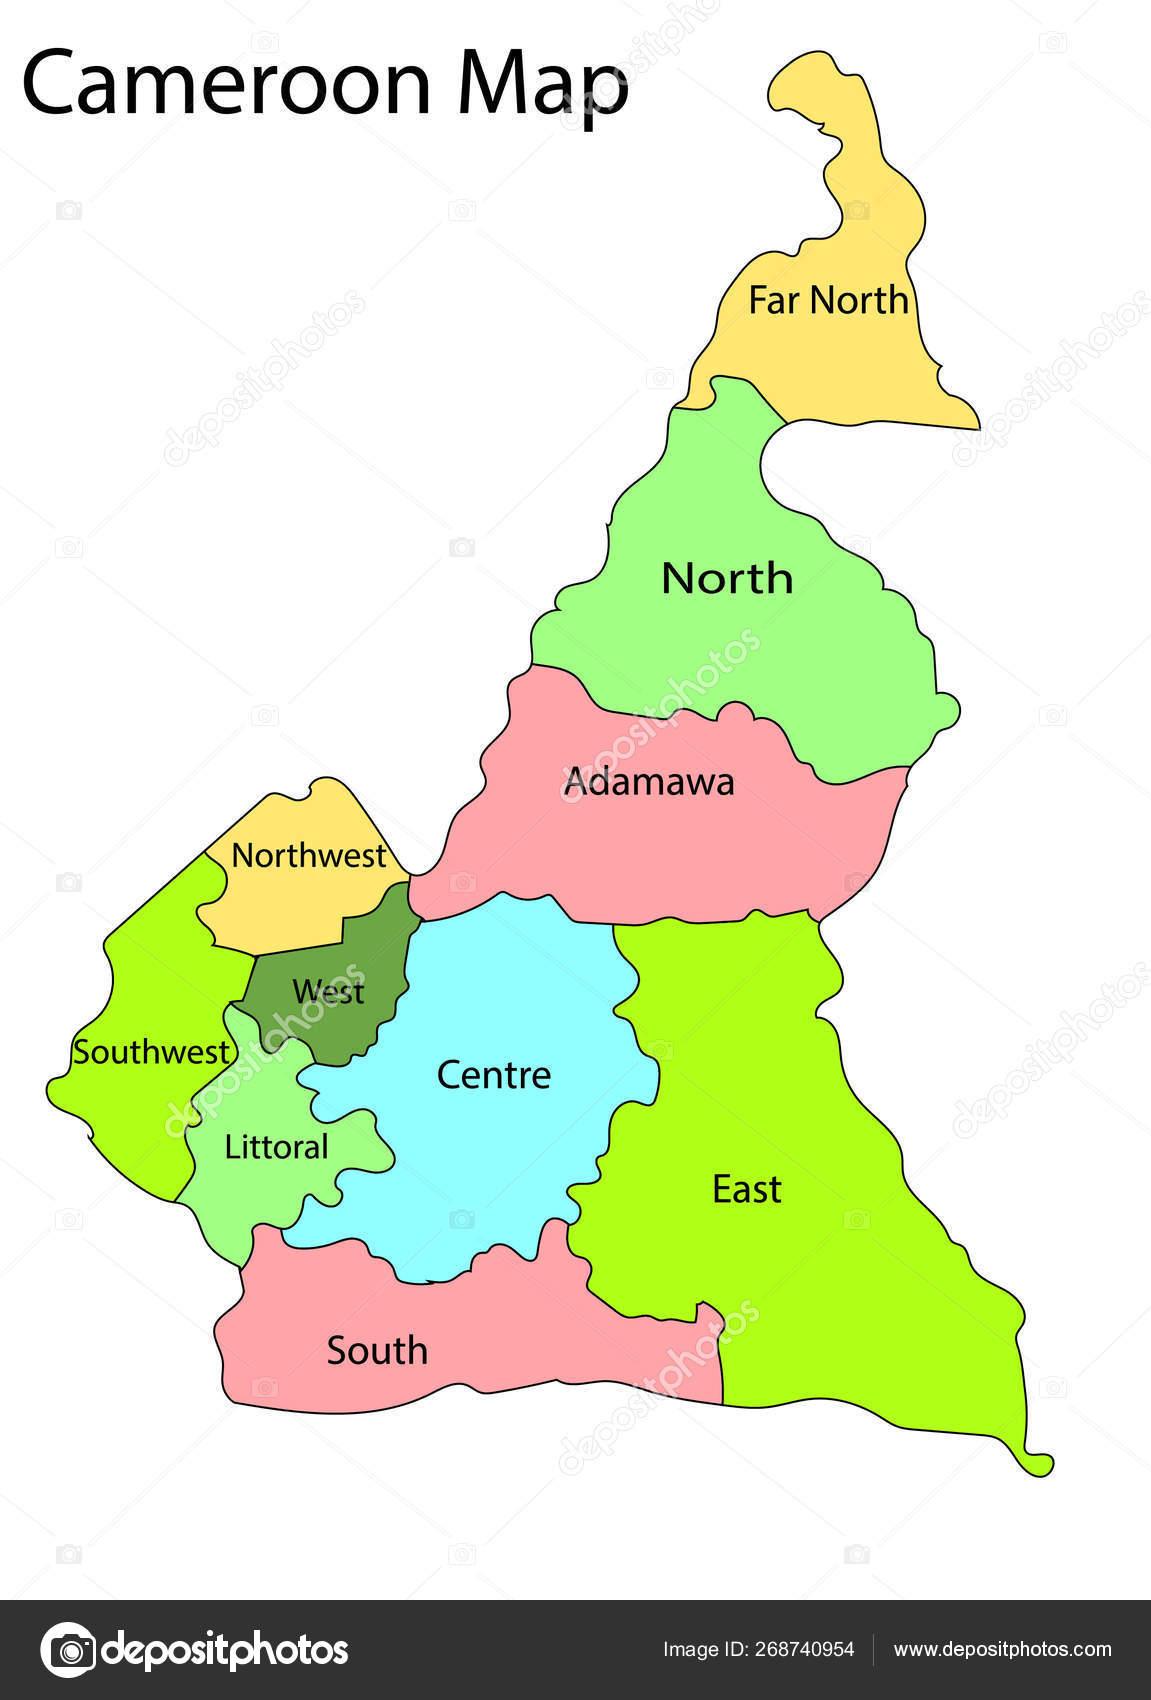 Cameroon Map on côte d'ivoire map, estonia map, grenada map, monaco map, gambia map, saudi arabia map, rwanda map, madagascar map, ghana map, egypt map, mali map, sudan map, namibia map, croatia map, tunisia map, congo map, algeria map, thailand map, kenya map, angola map, liberia map, cape verde map, morocco map, gabon map, uganda map, africa map, libya map, nigeria map, senegal map, malawi map, ecuador map, comoros map, niger map, ethiopia map, mozambique map, zimbabwe map,